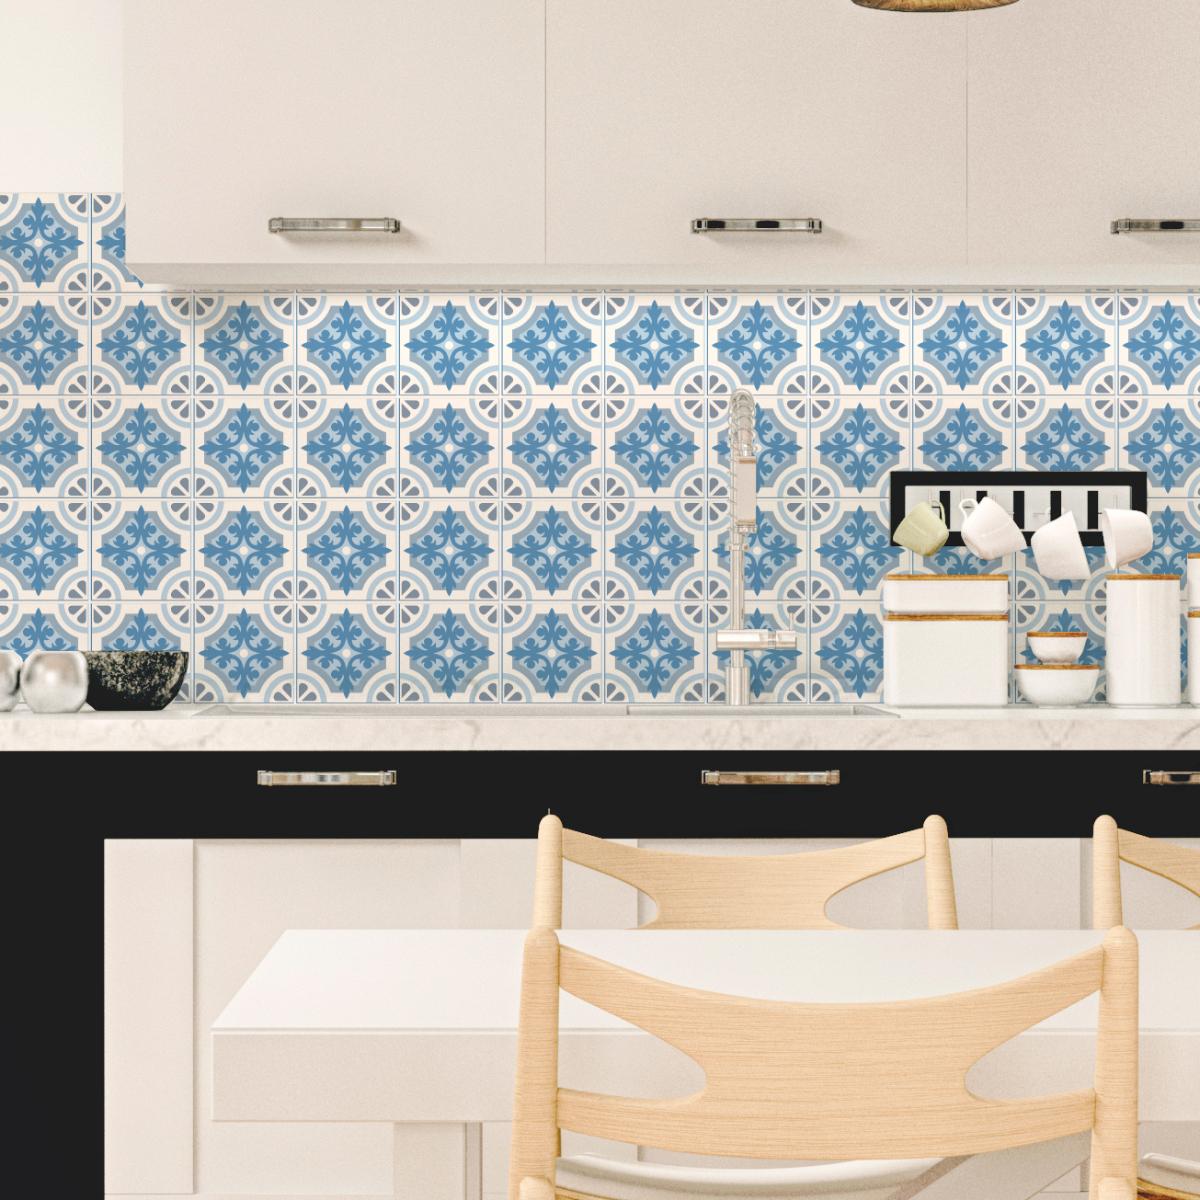 30 stickers carrelages azulejos tosca salle de bain mur salle de bain ambiance sticker. Black Bedroom Furniture Sets. Home Design Ideas